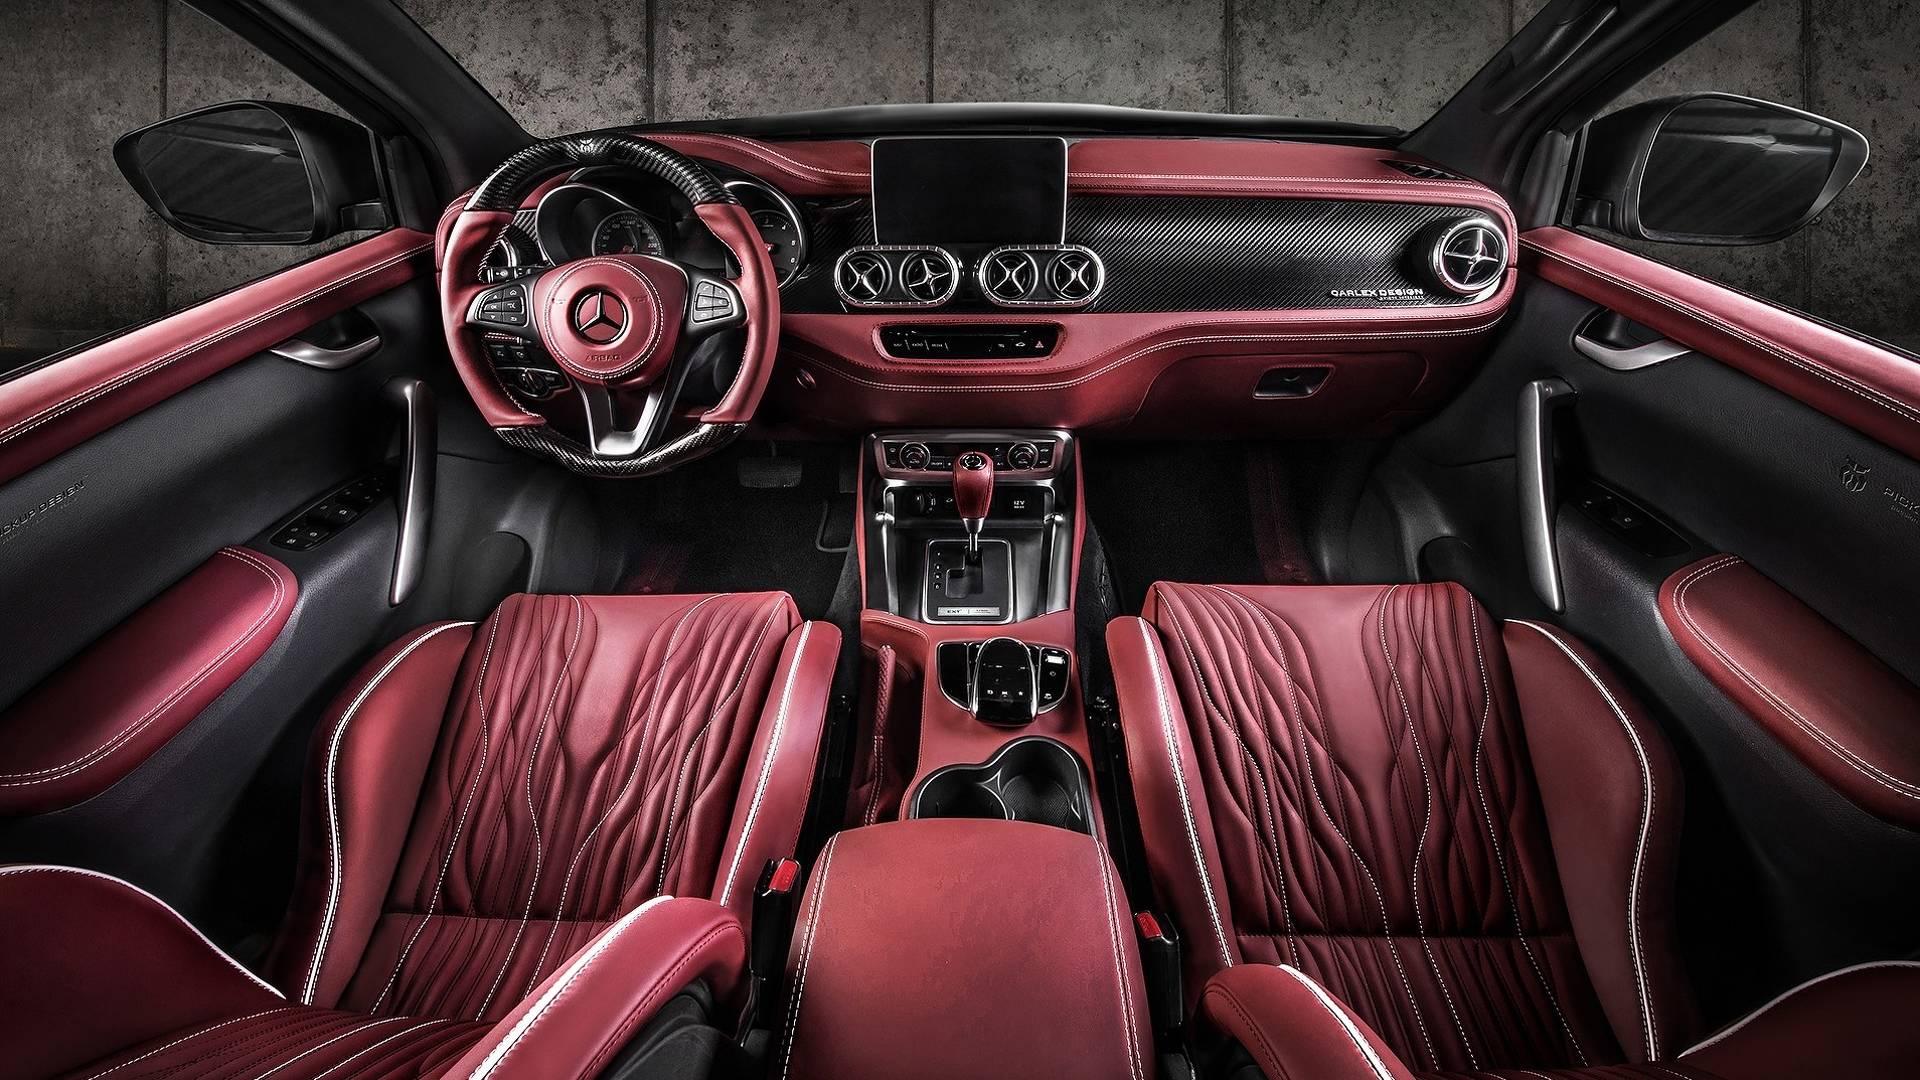 carlex design mercedes benz x class red interior. Black Bedroom Furniture Sets. Home Design Ideas